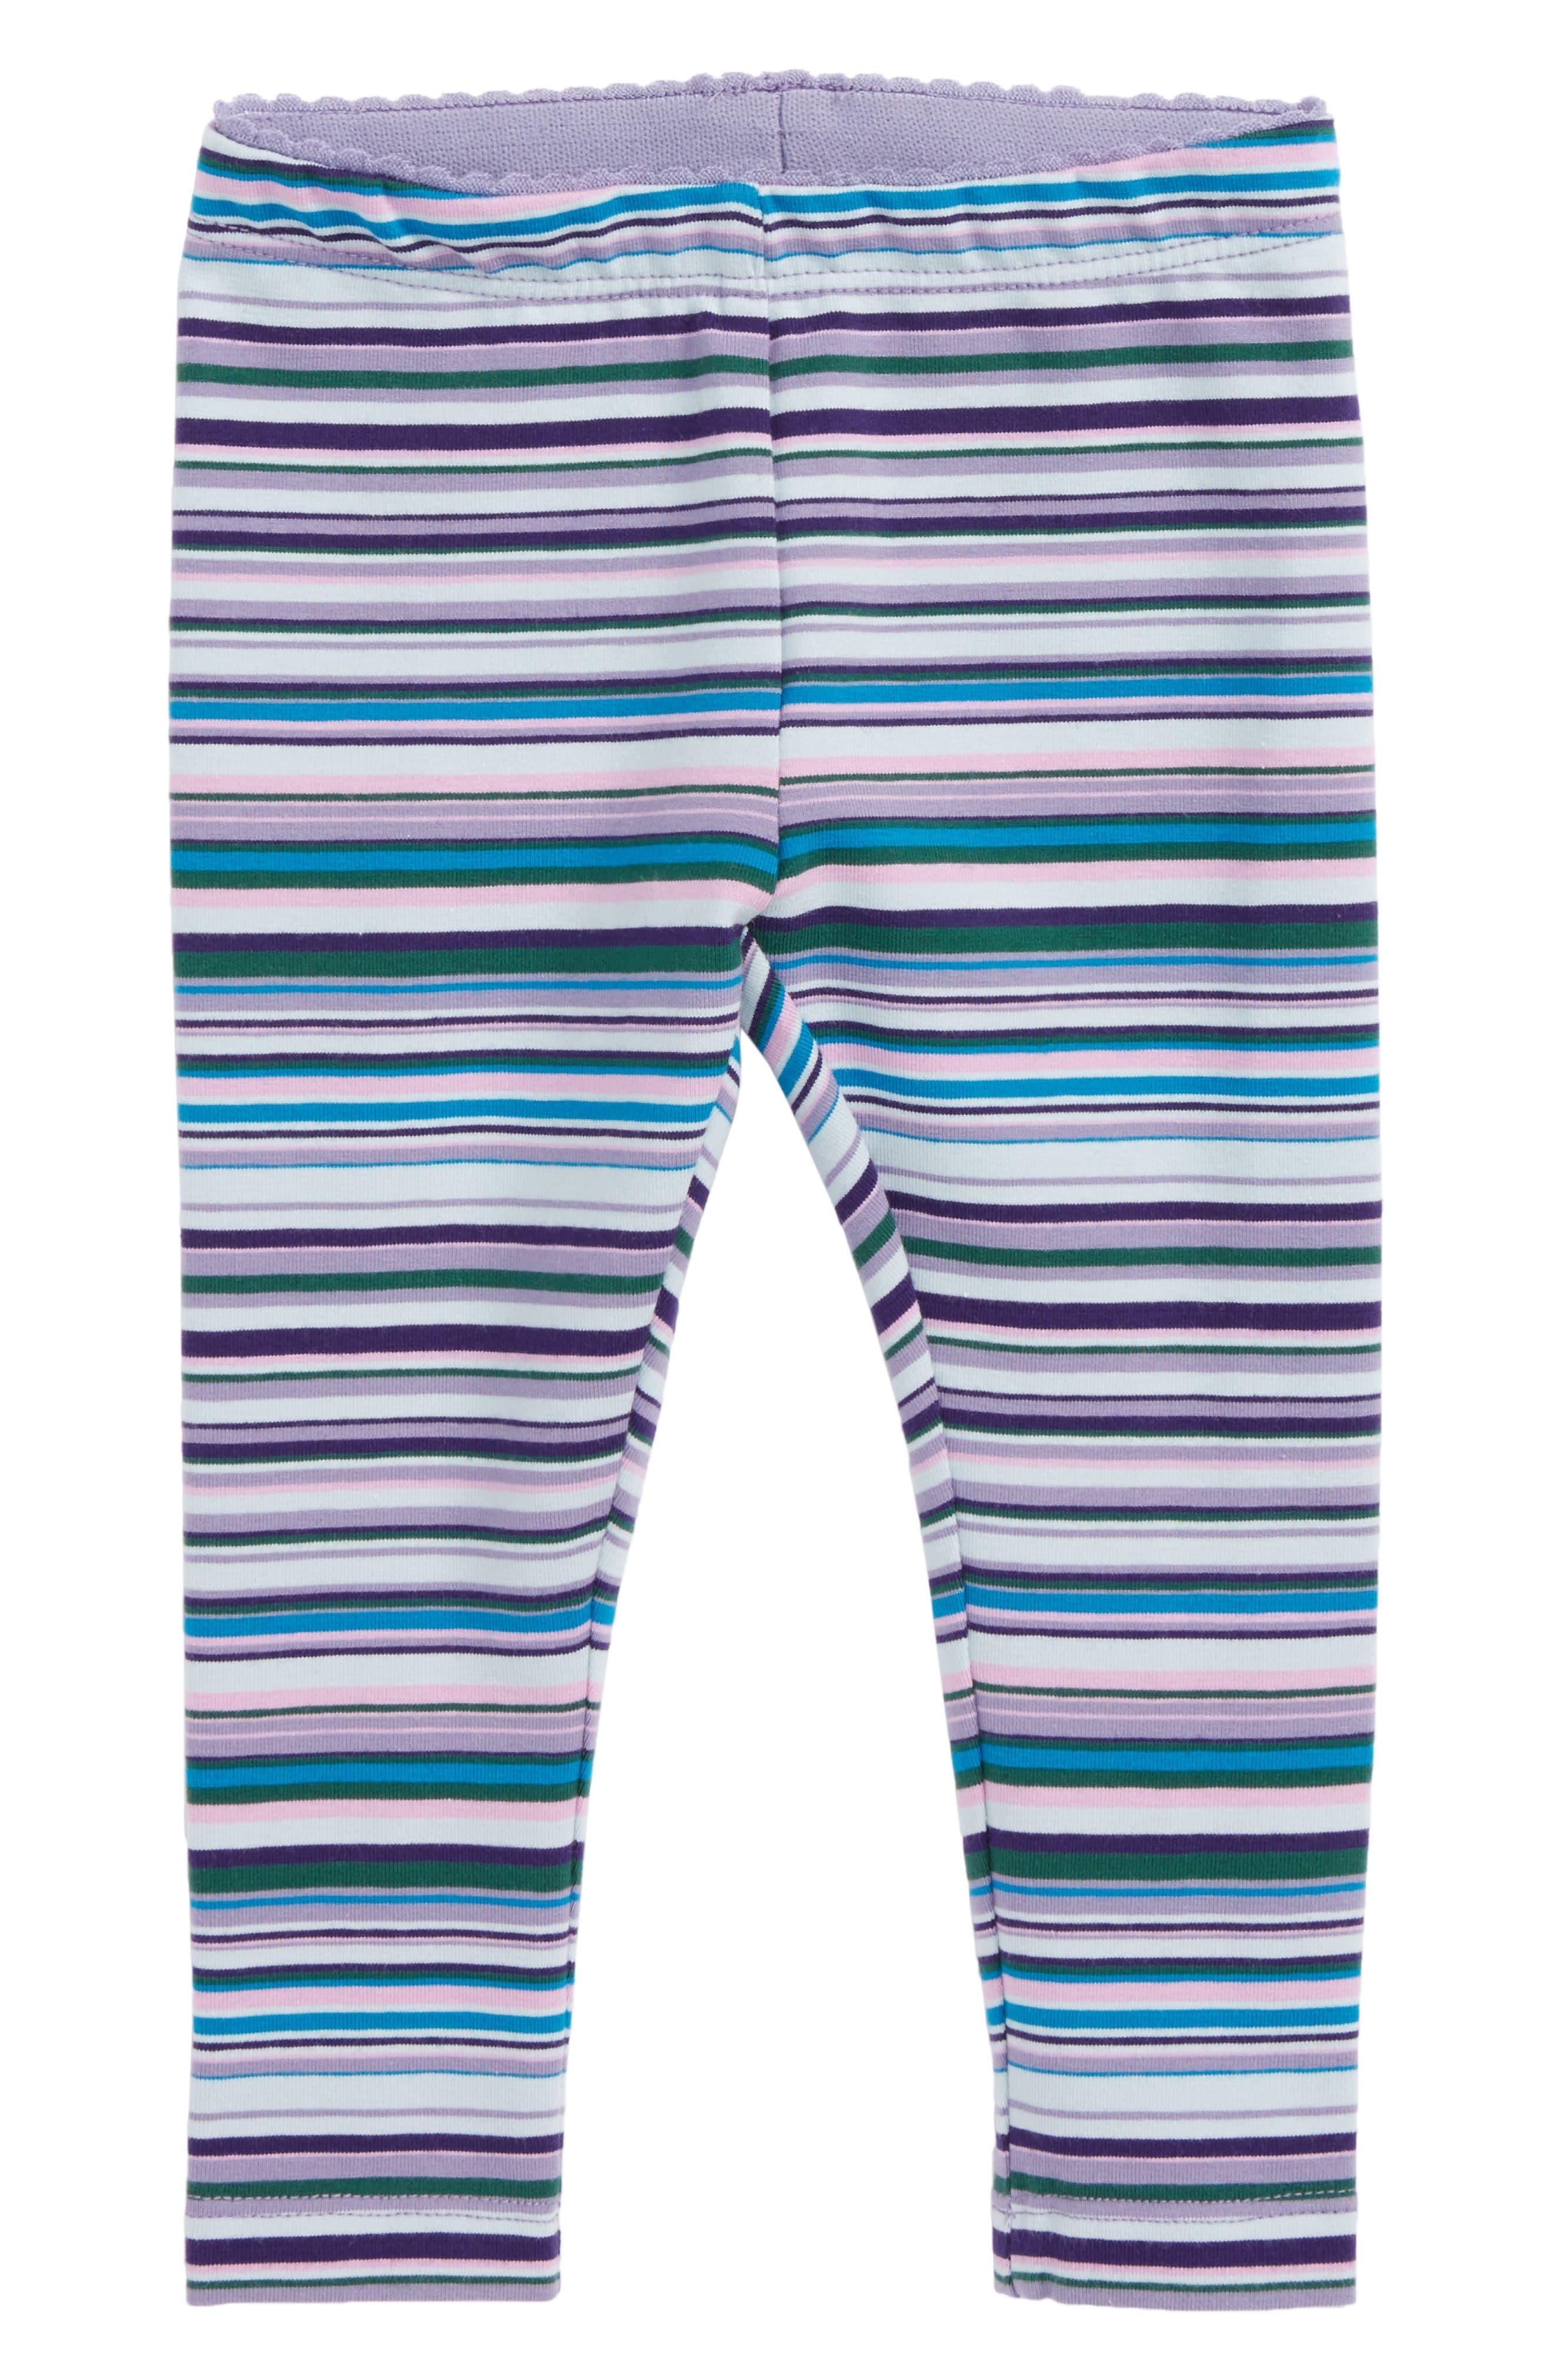 Main Image - Tea Collection Stripe Leggings (Baby Girls)